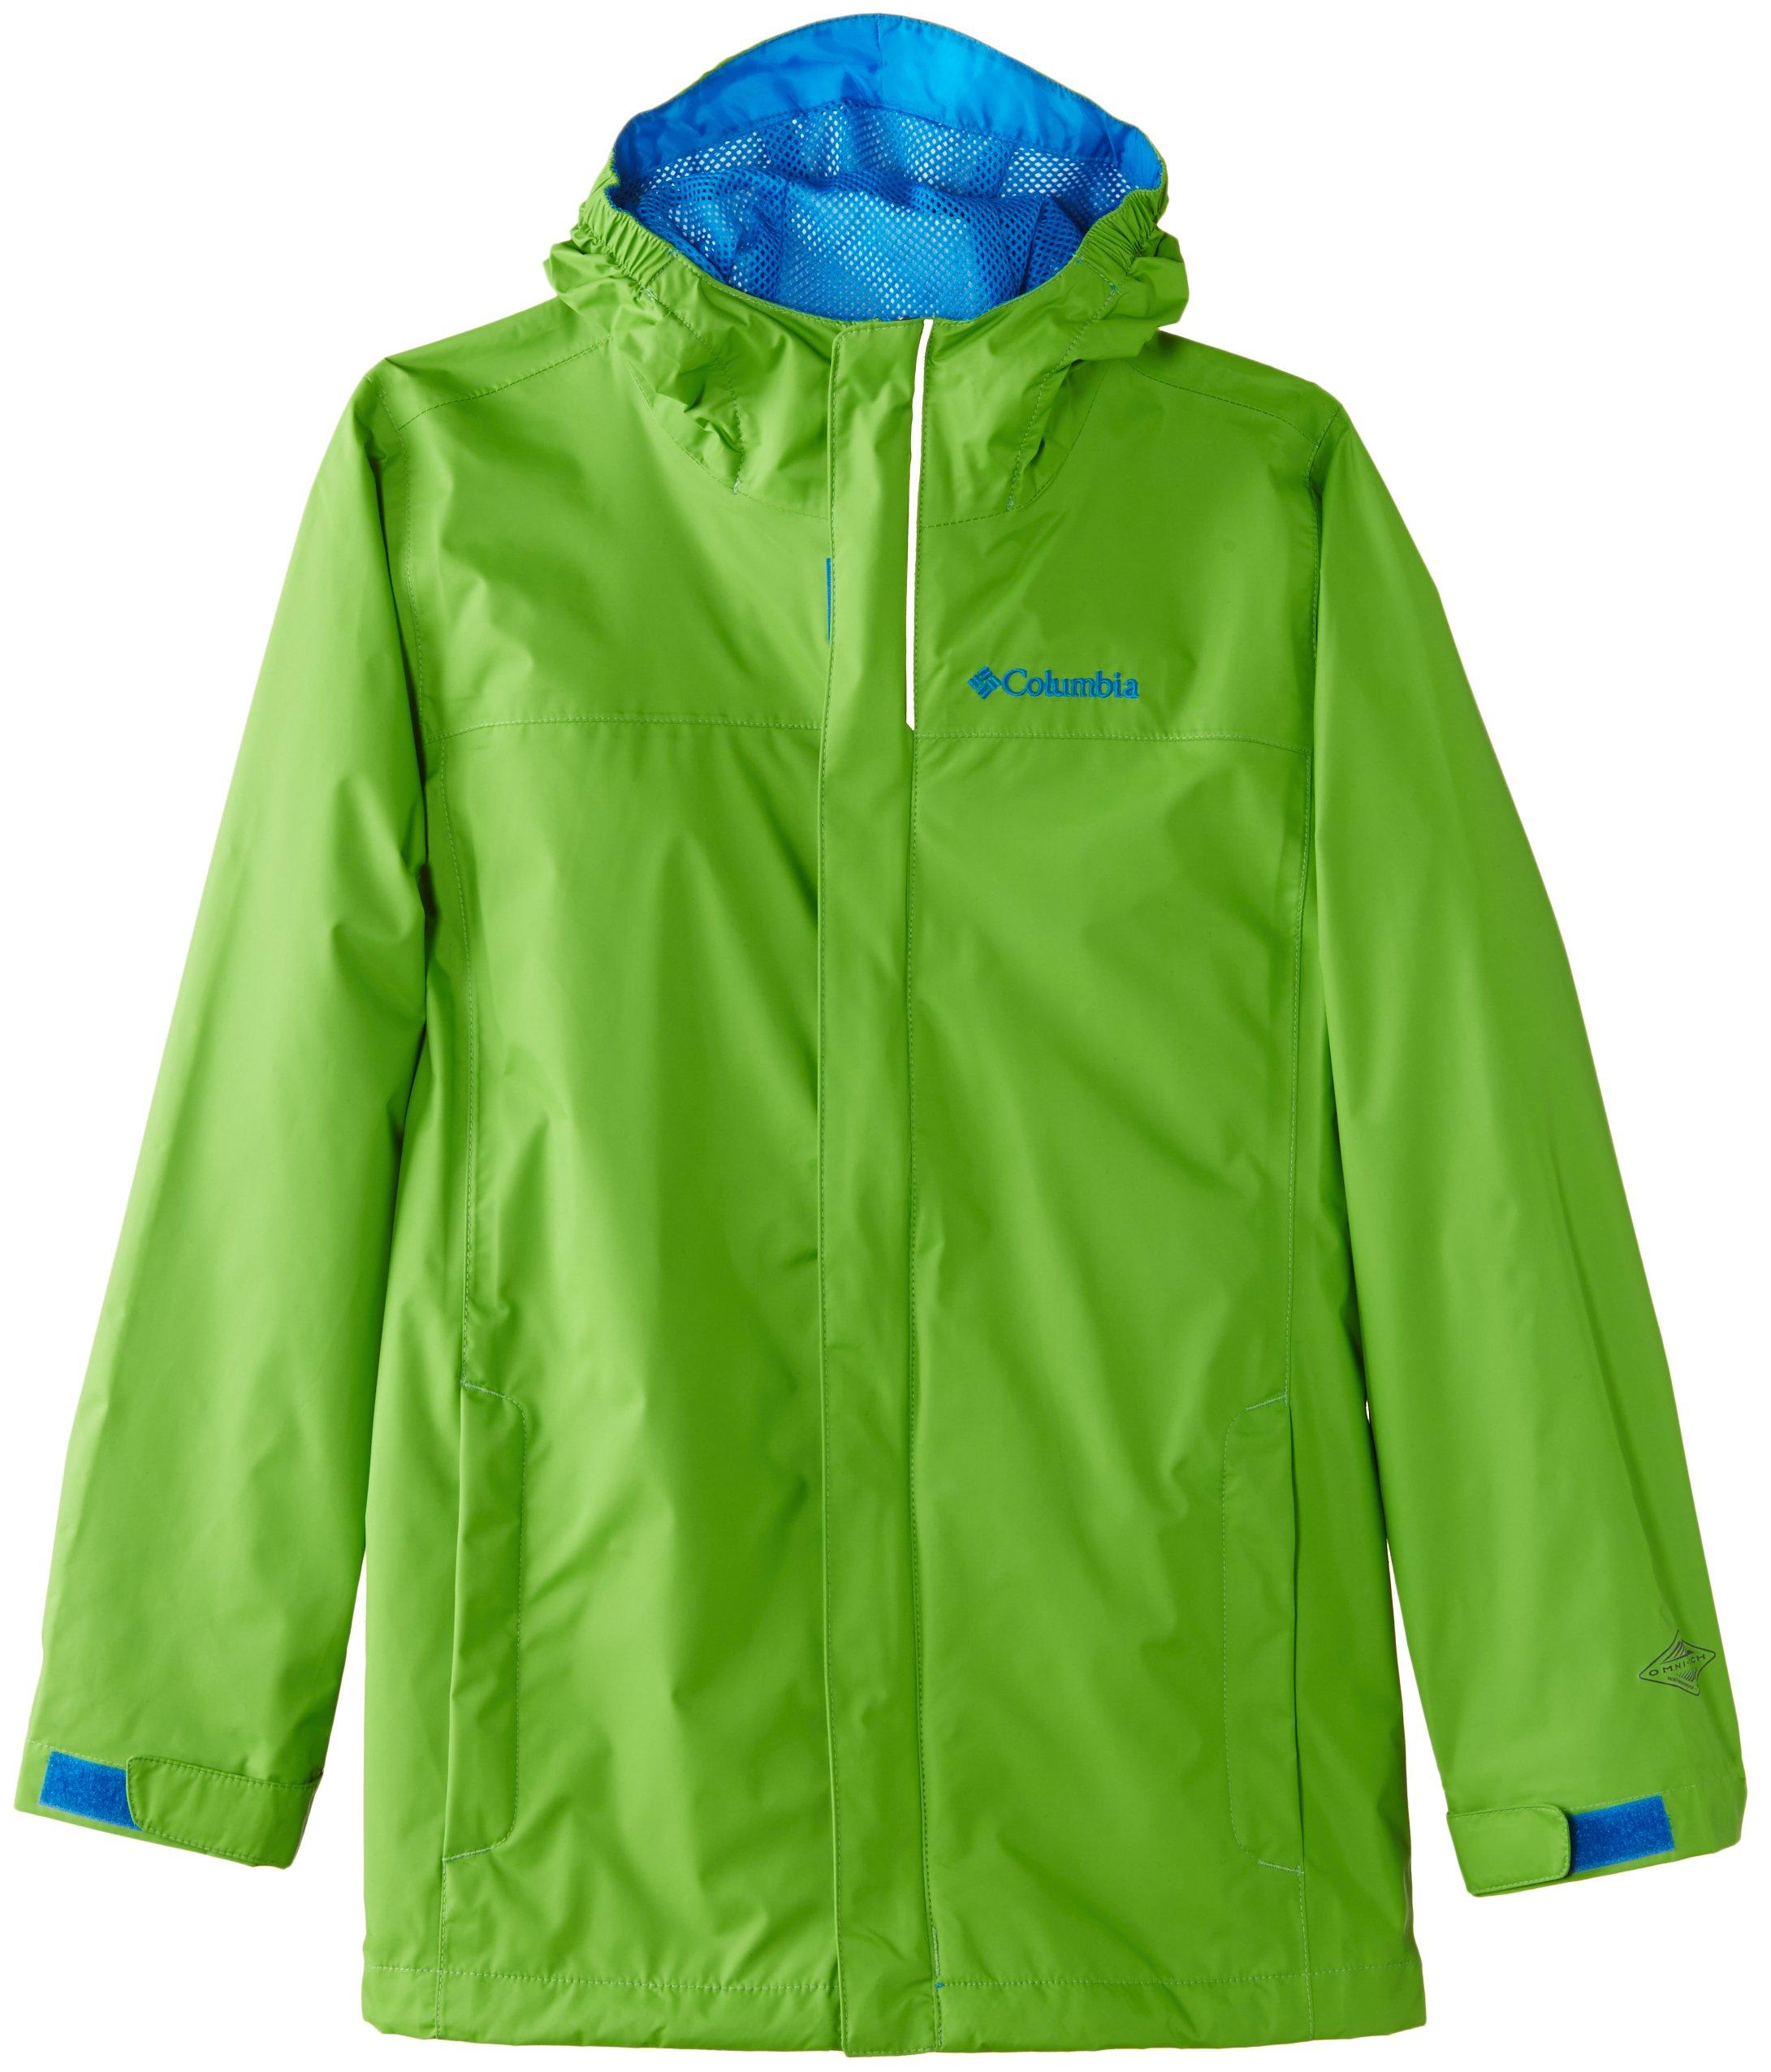 Columbia Little Boys' Watertight Jacket, Cyber Green, XX-Small